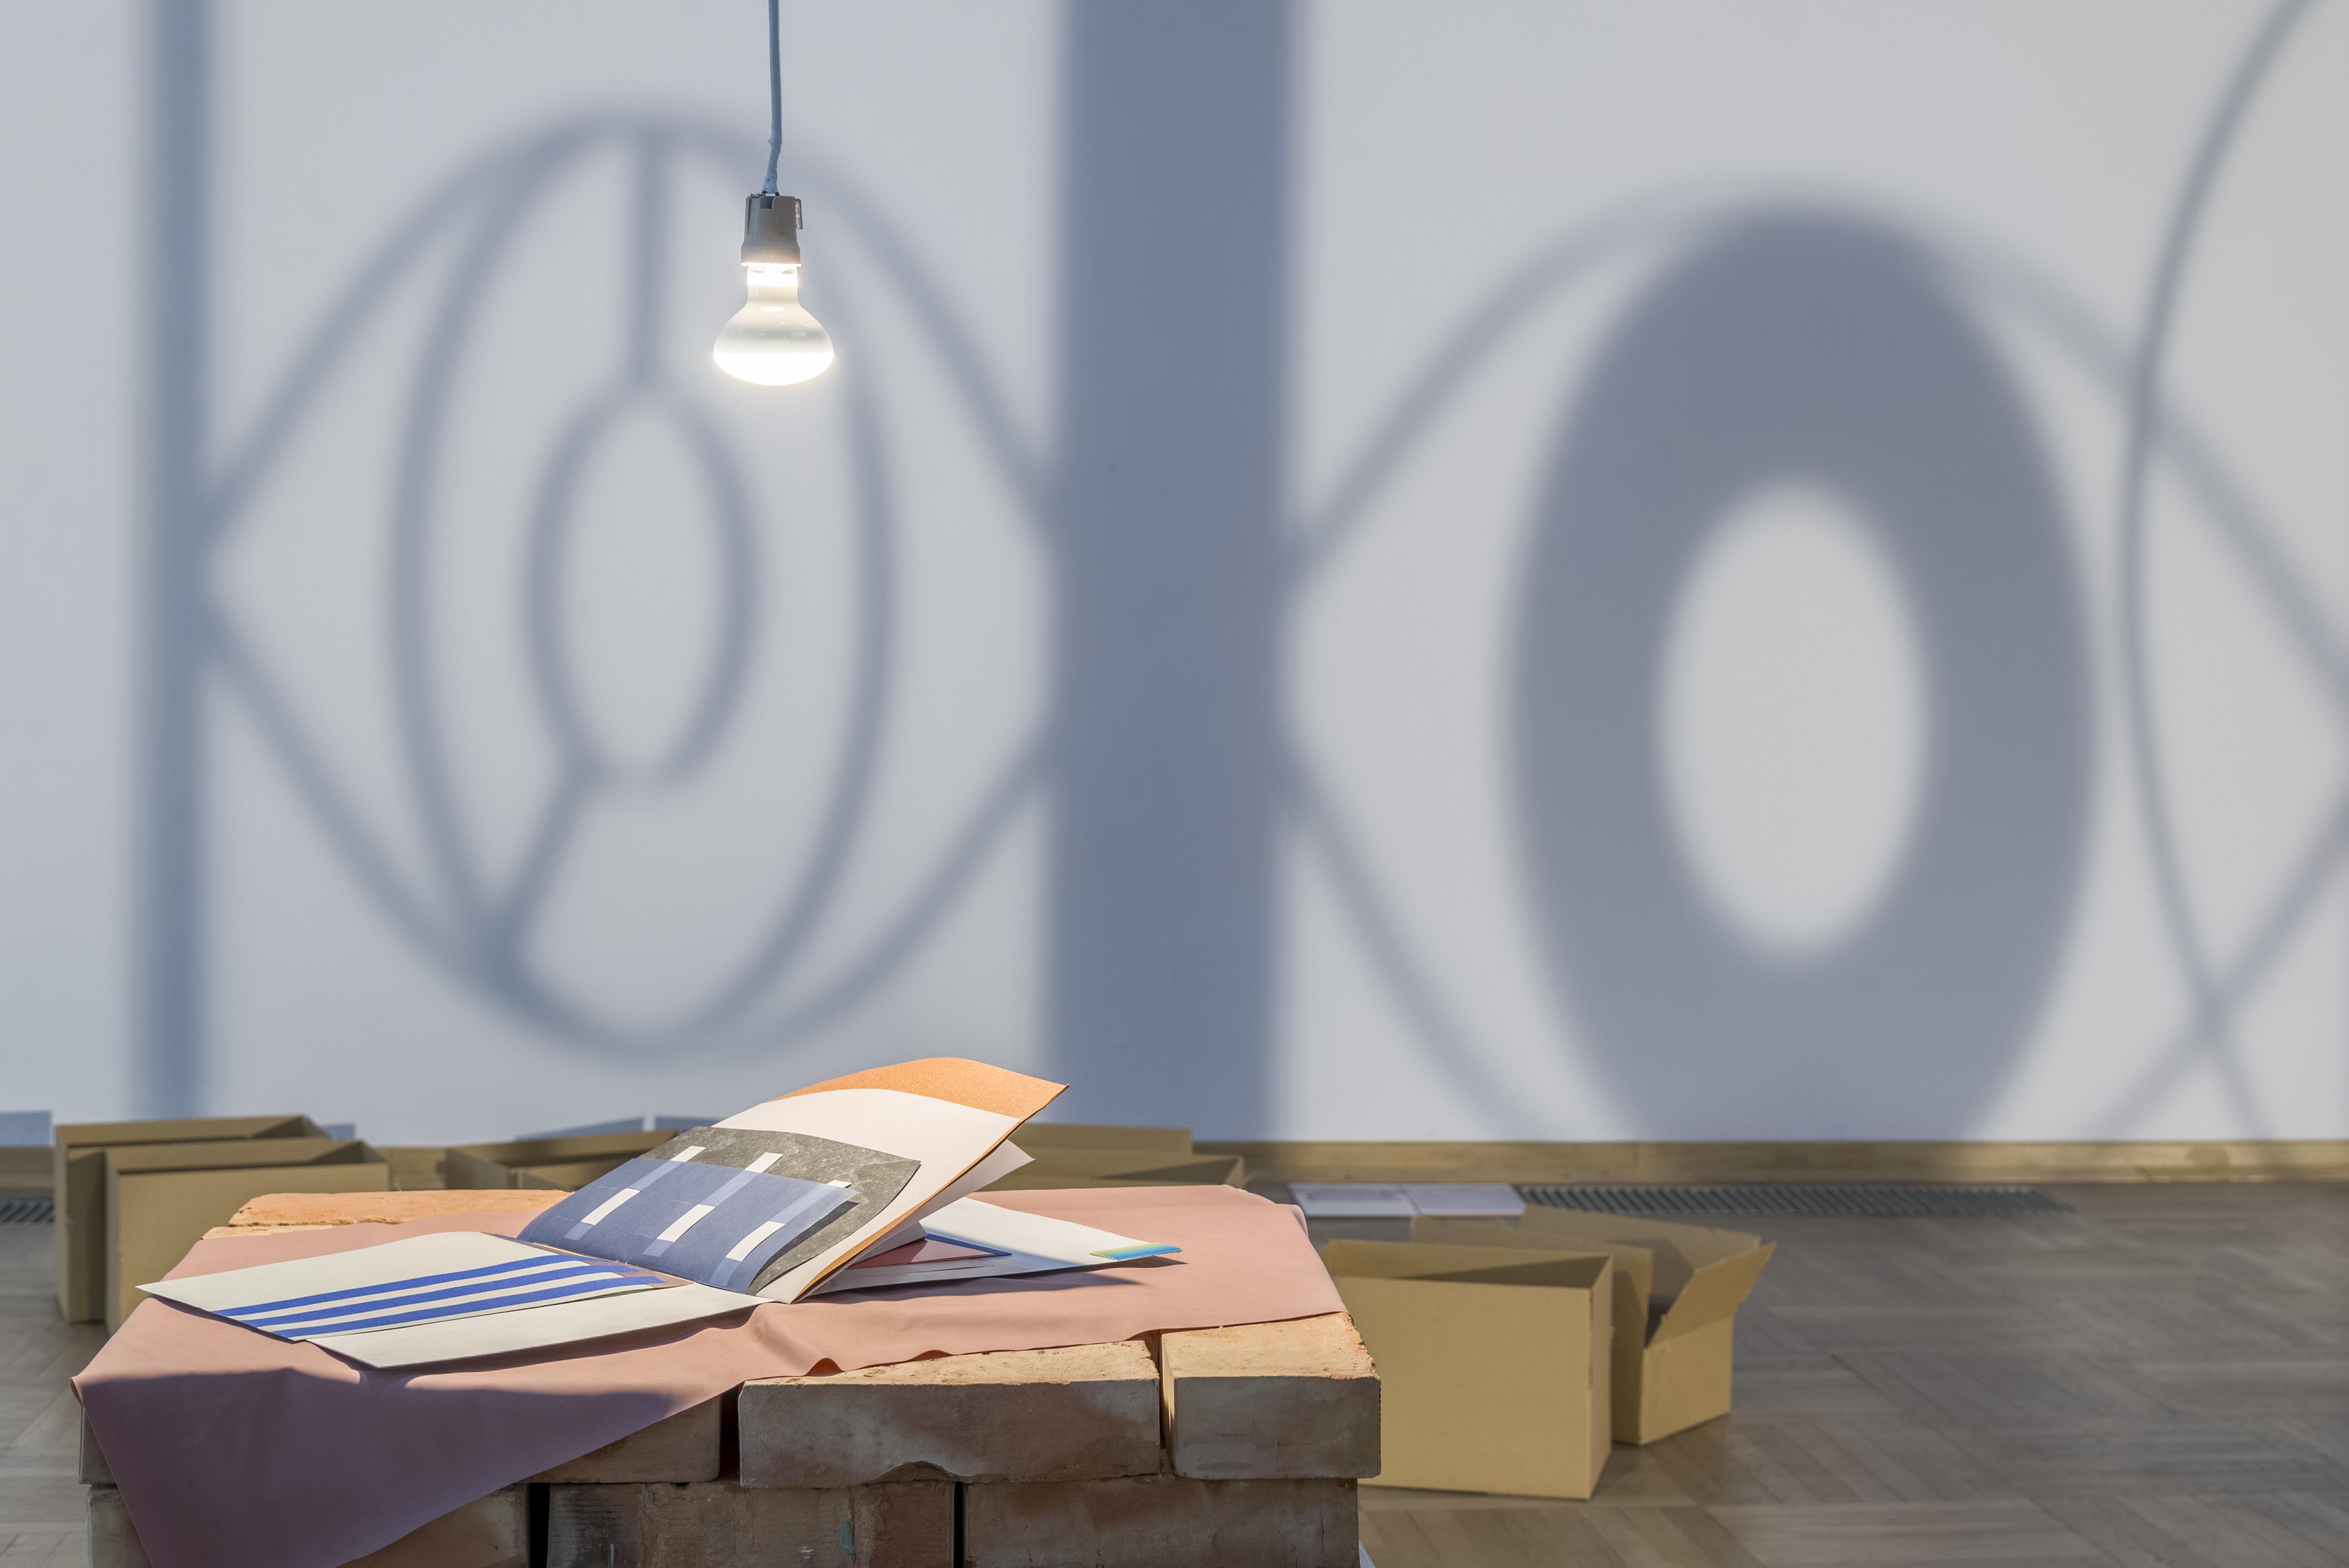 Viktorija Rybakova, Katalog Navakasa, 2015, wtle Drzwi obrotowe (fragment), Viktorija Rybakova